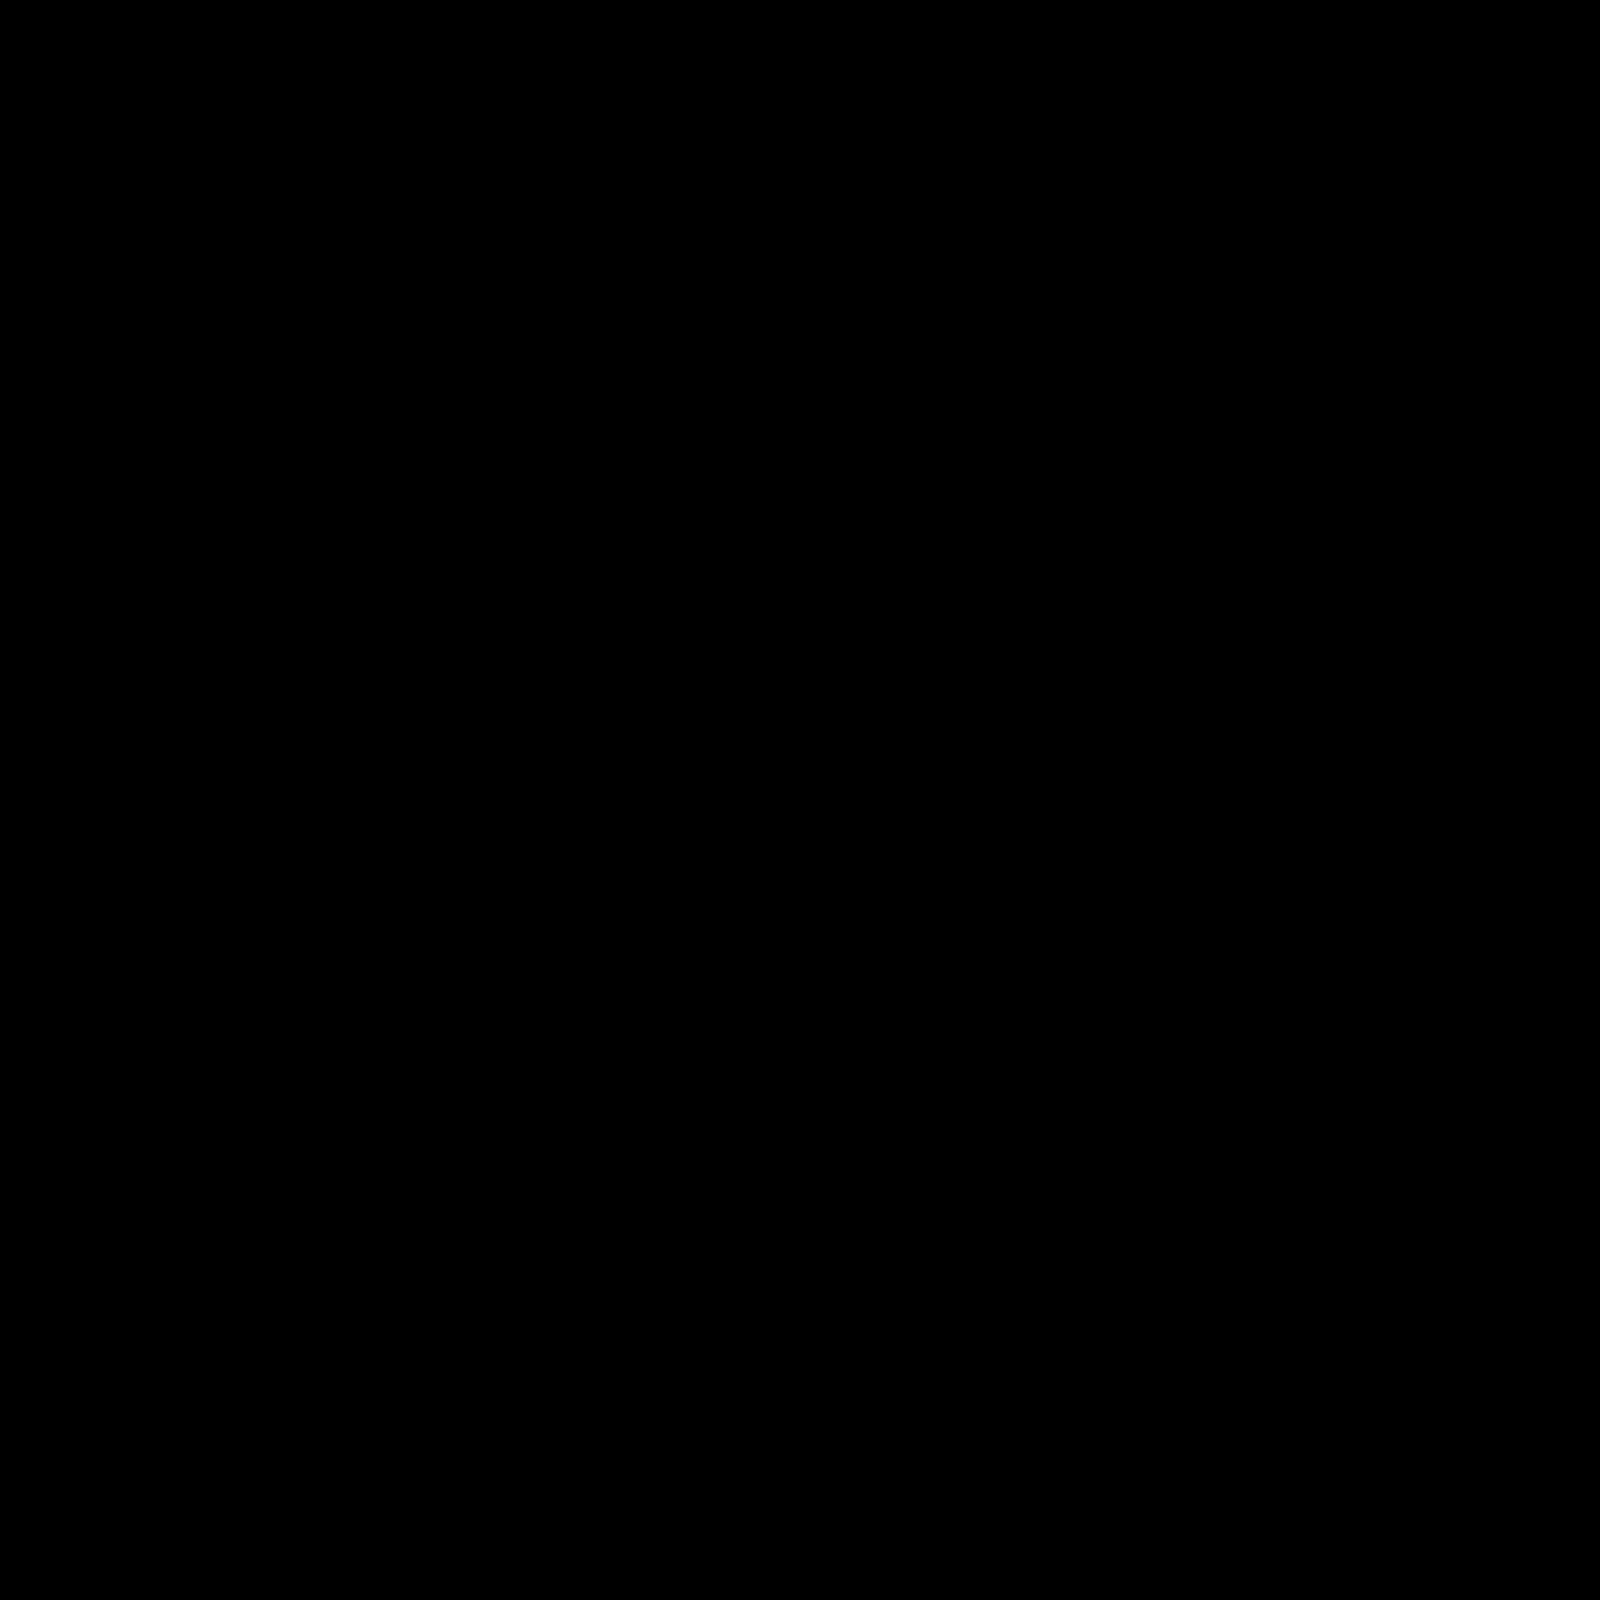 Travel Signpost icon